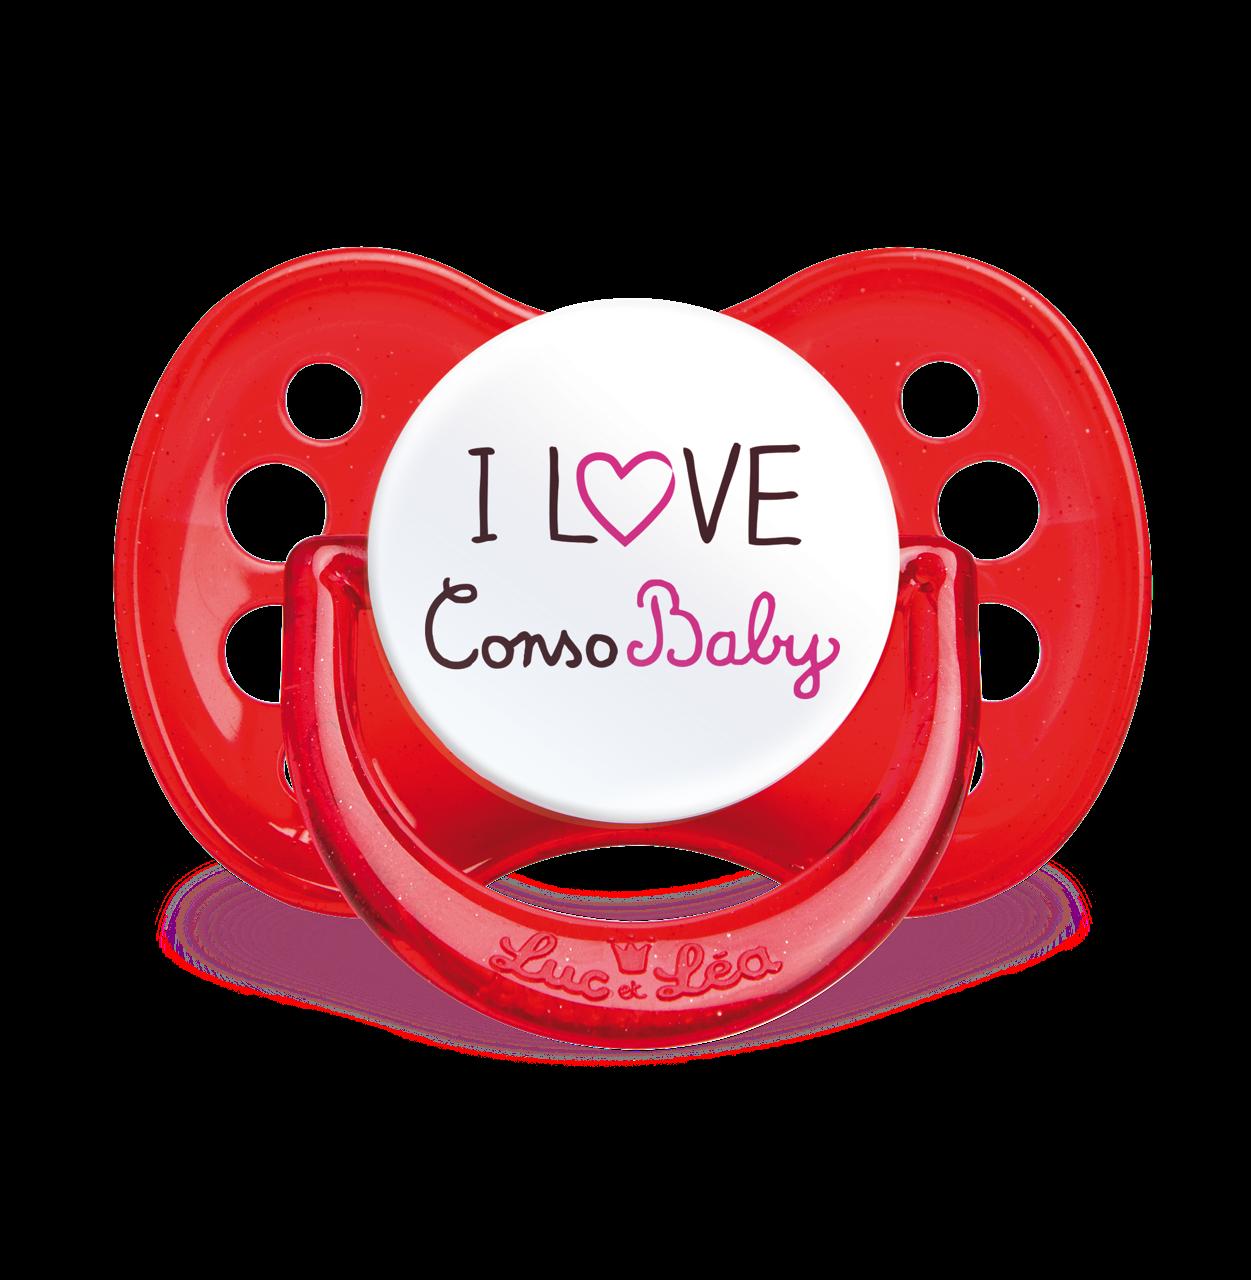 Sucette I Love ConsoBaby LUC ET LEA